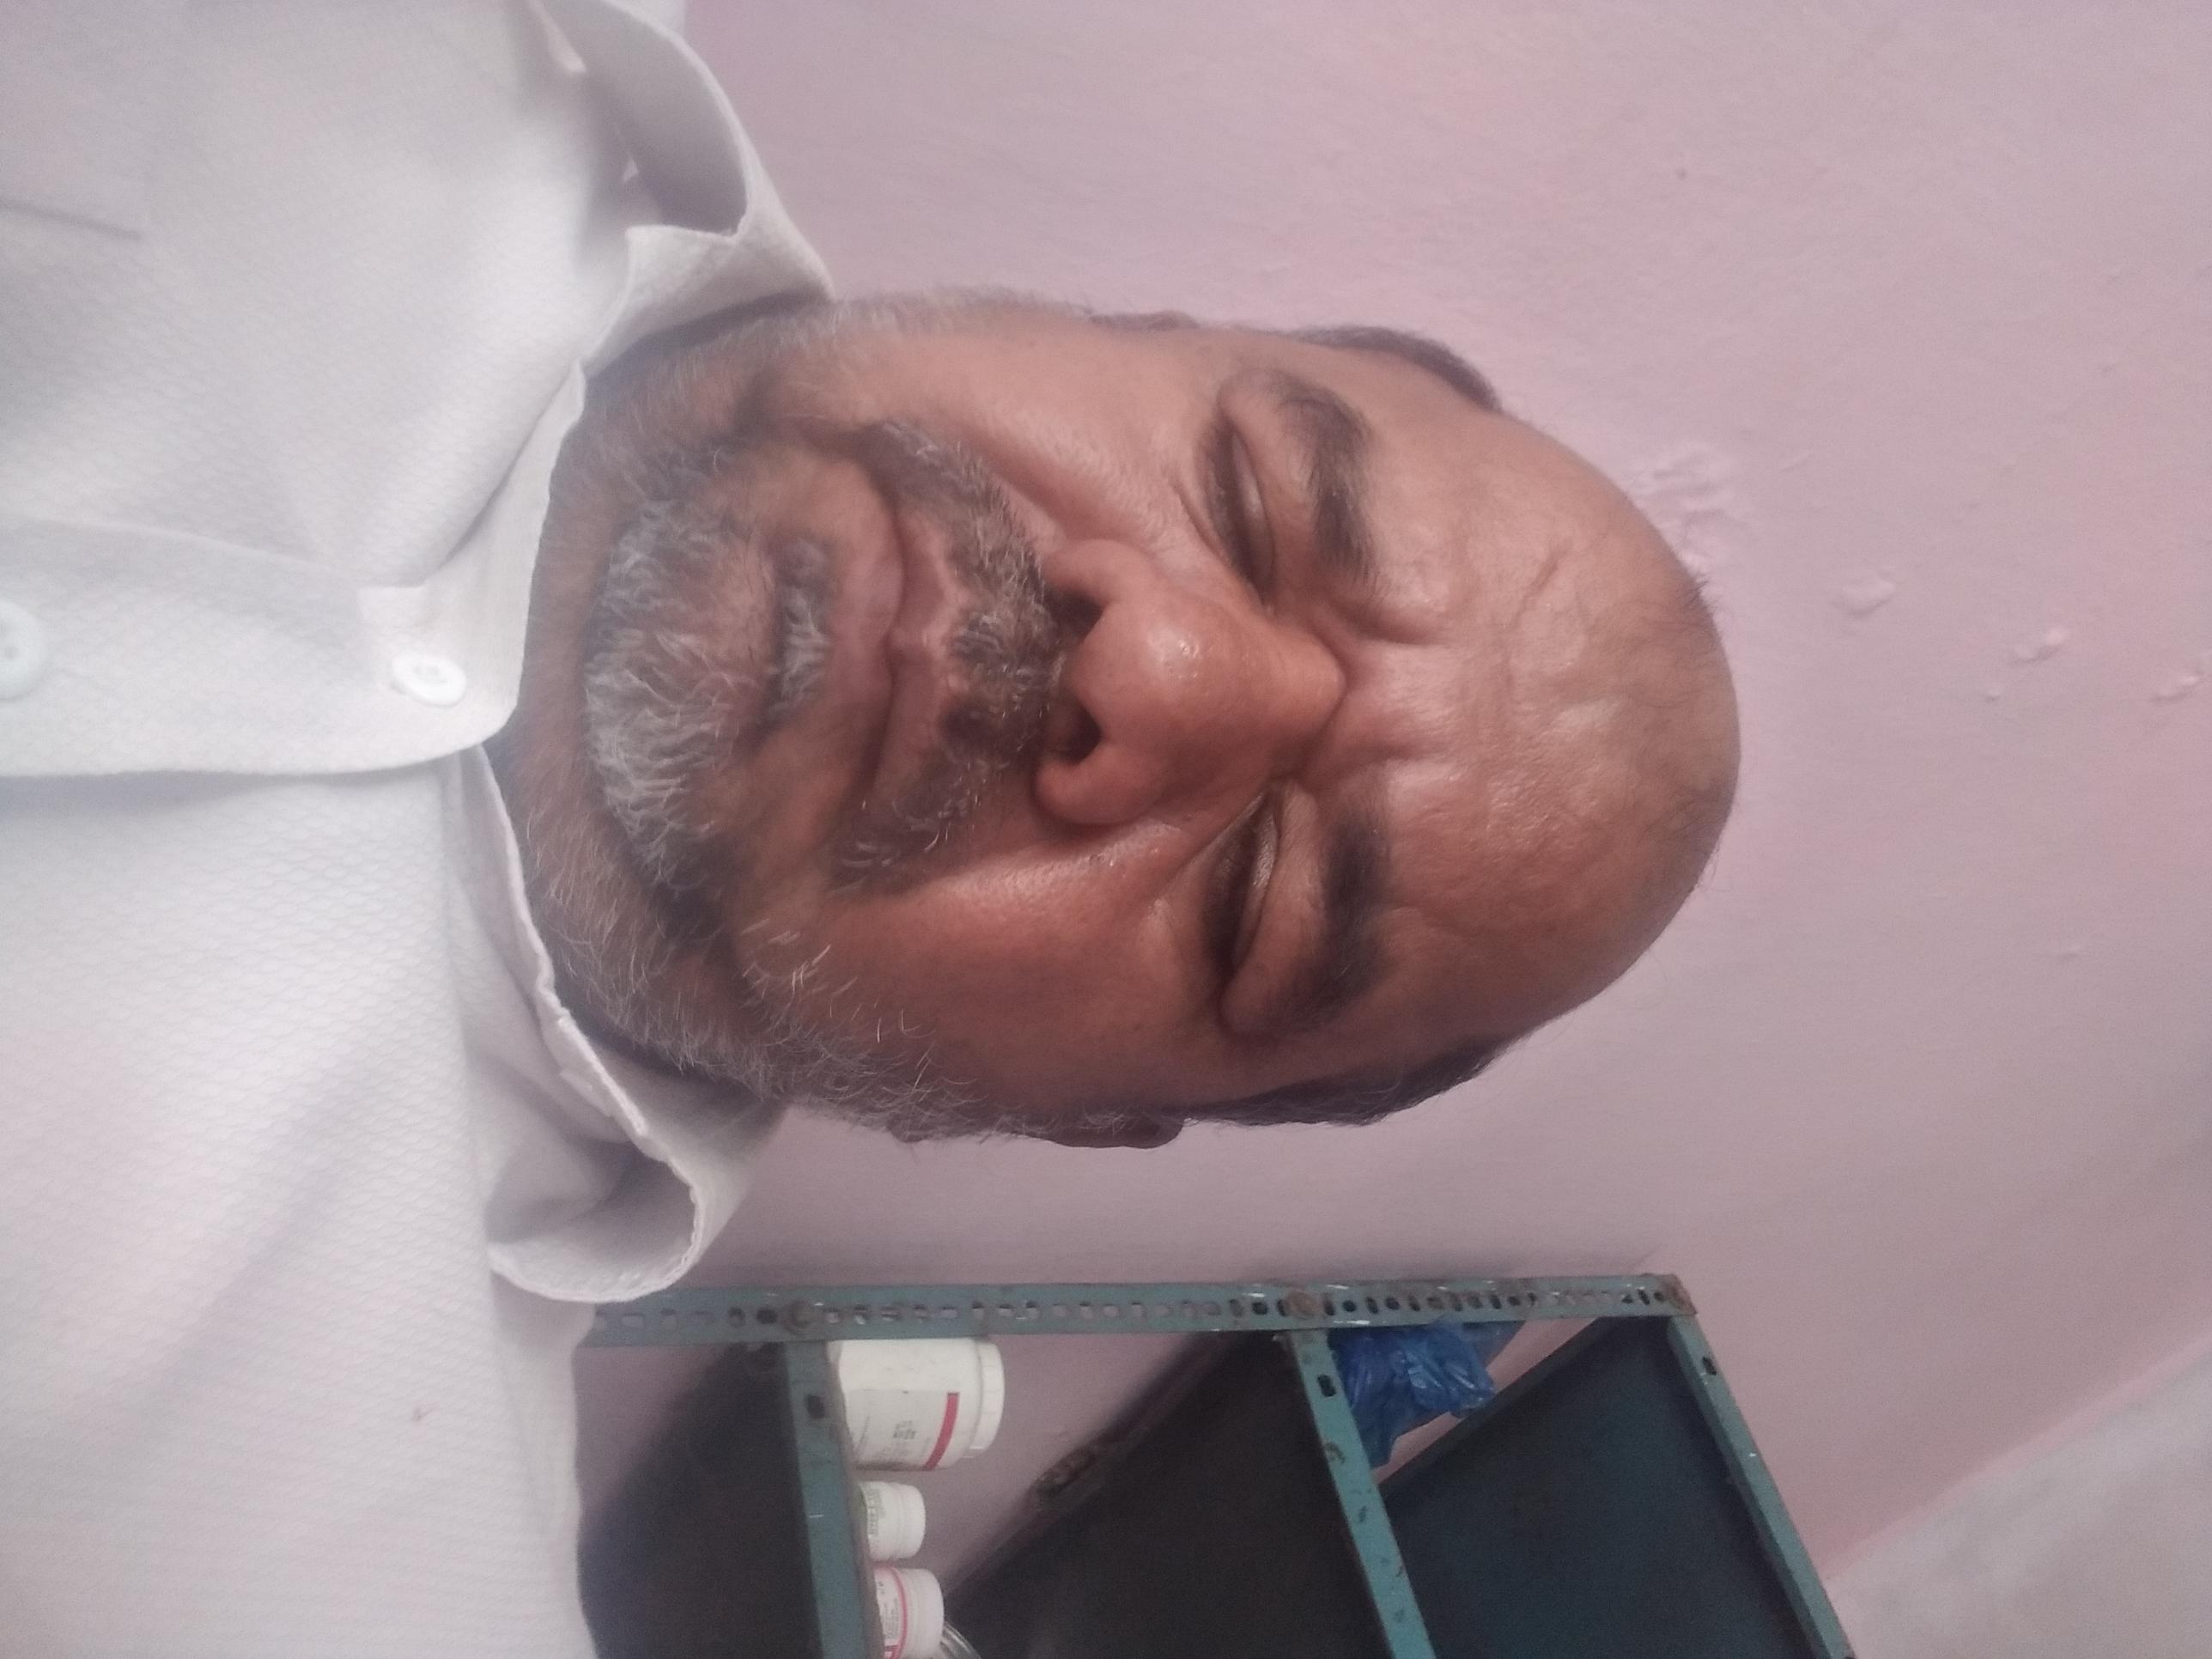 Dr. Mohammed Maqsood Ali